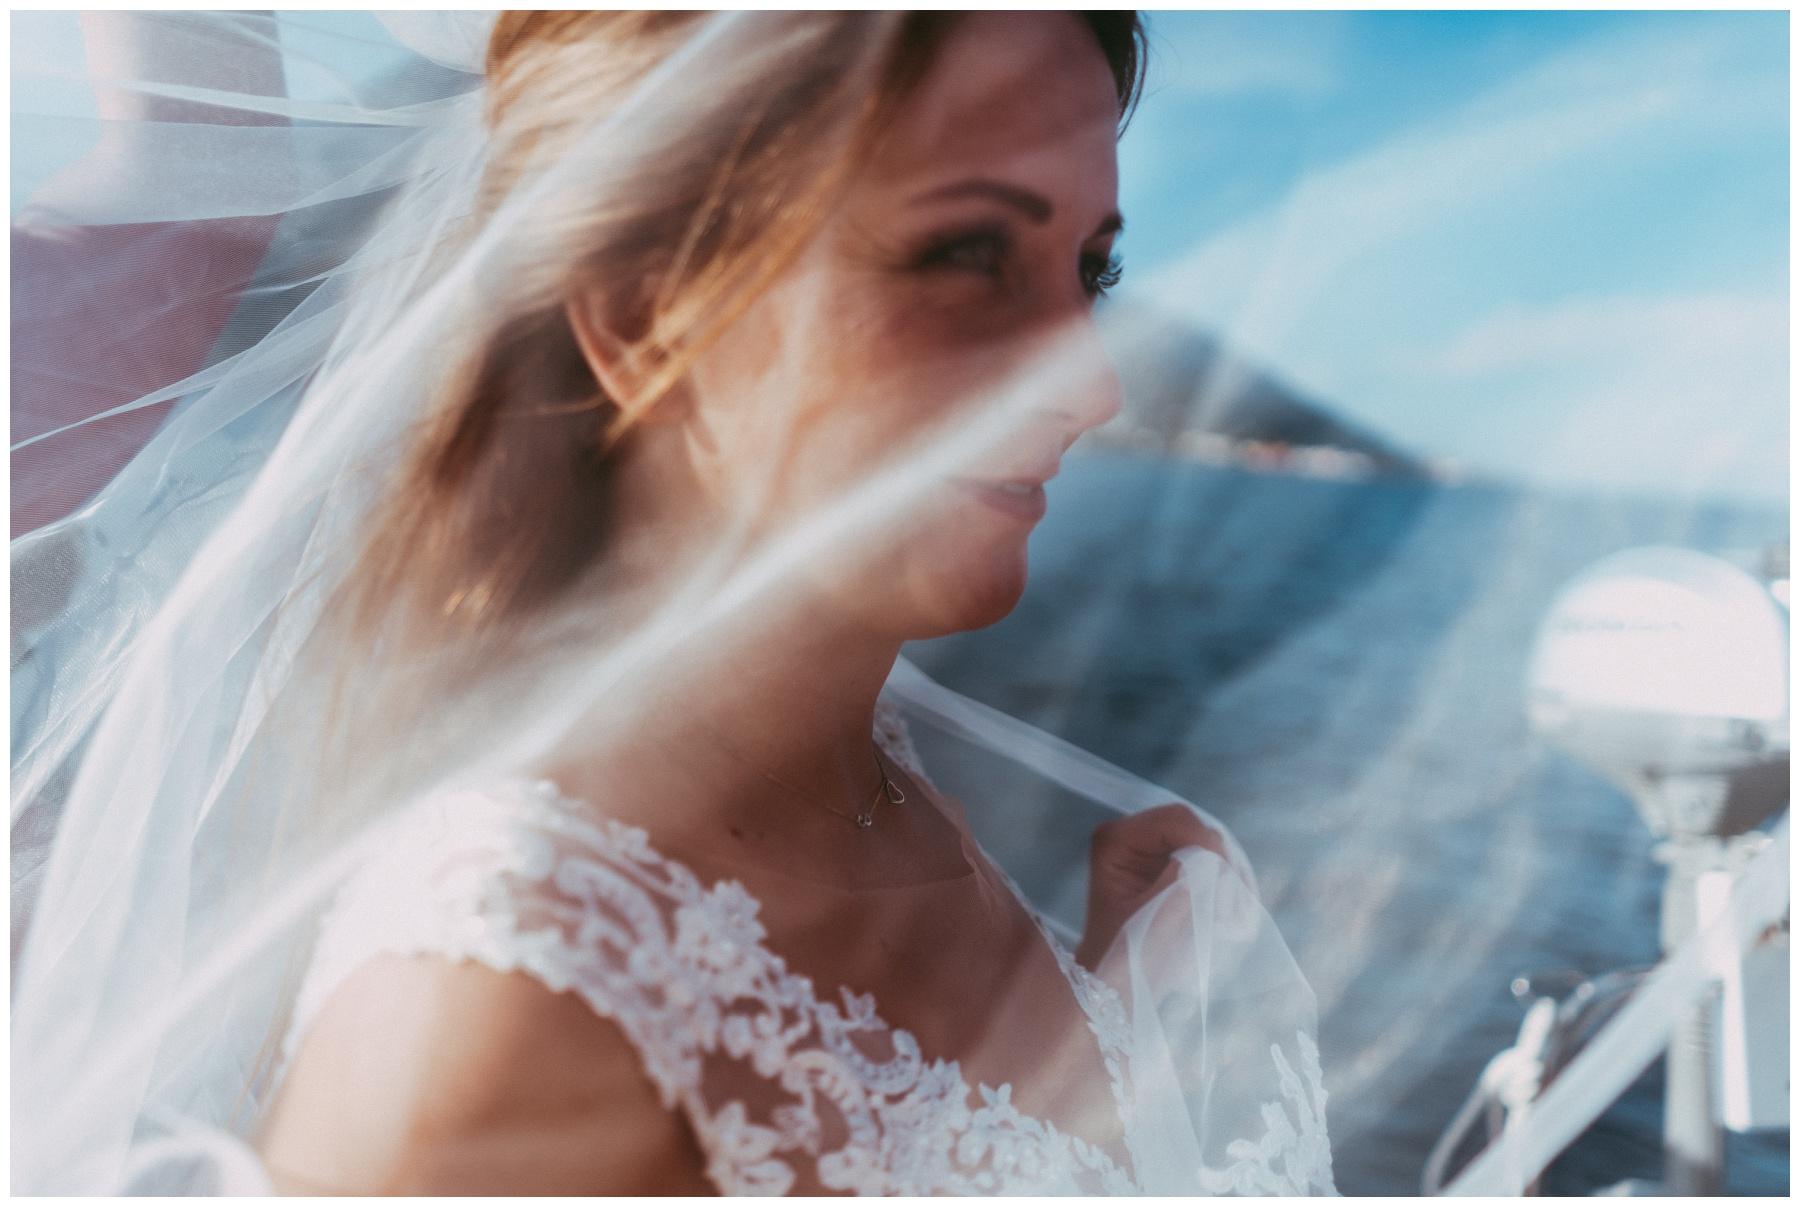 veil wedding dress